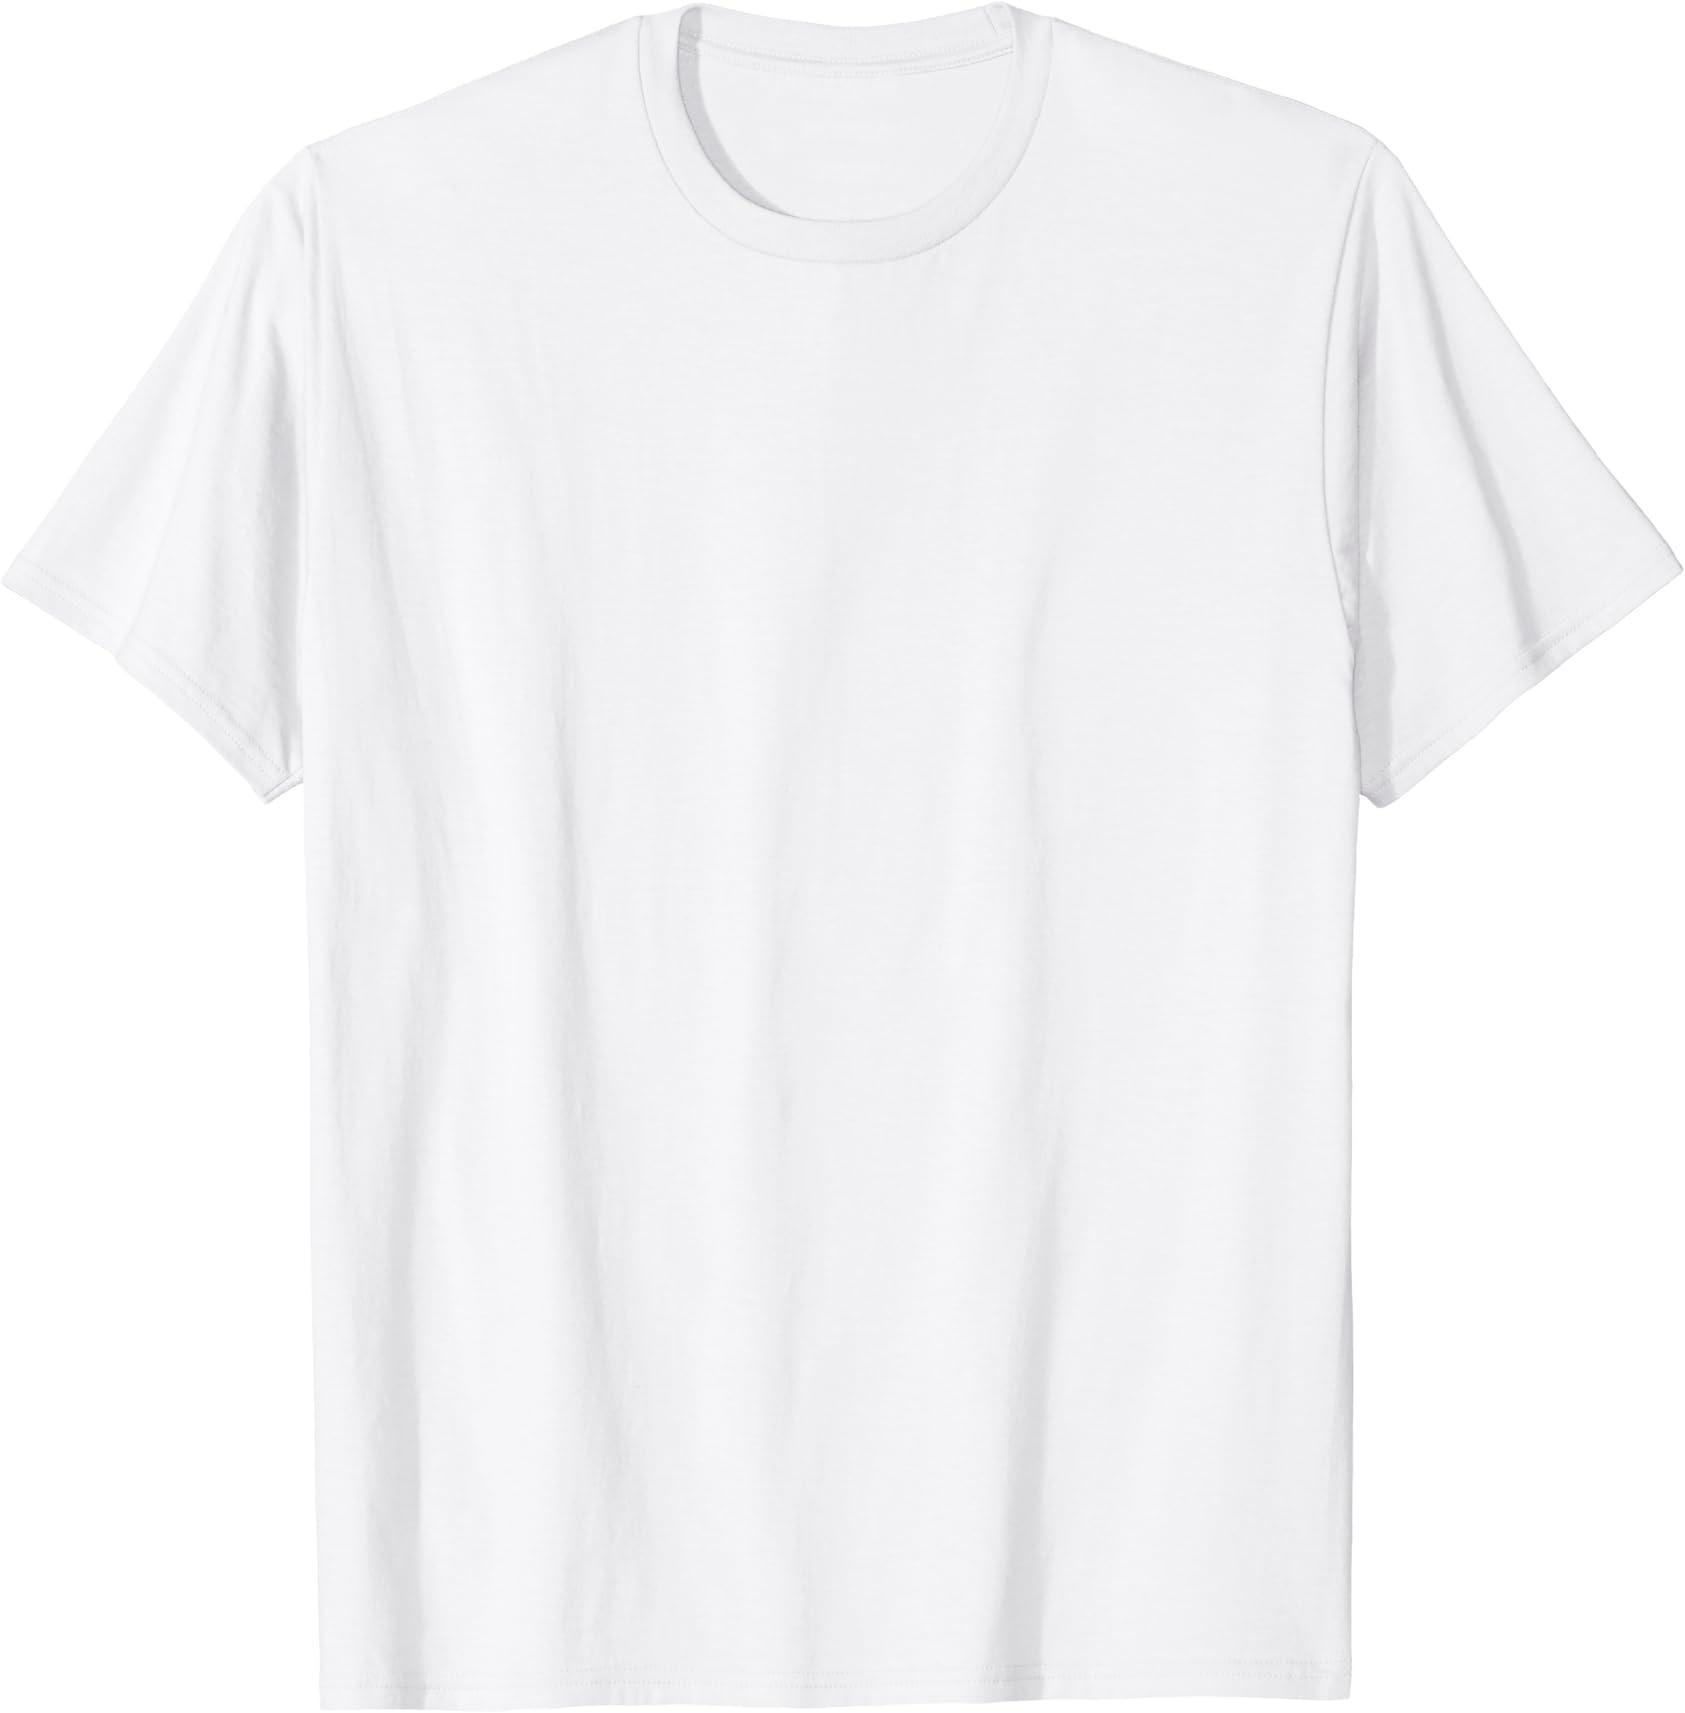 Men/'s Premium Cotton Shark Ocean Attack Print T-Shirt